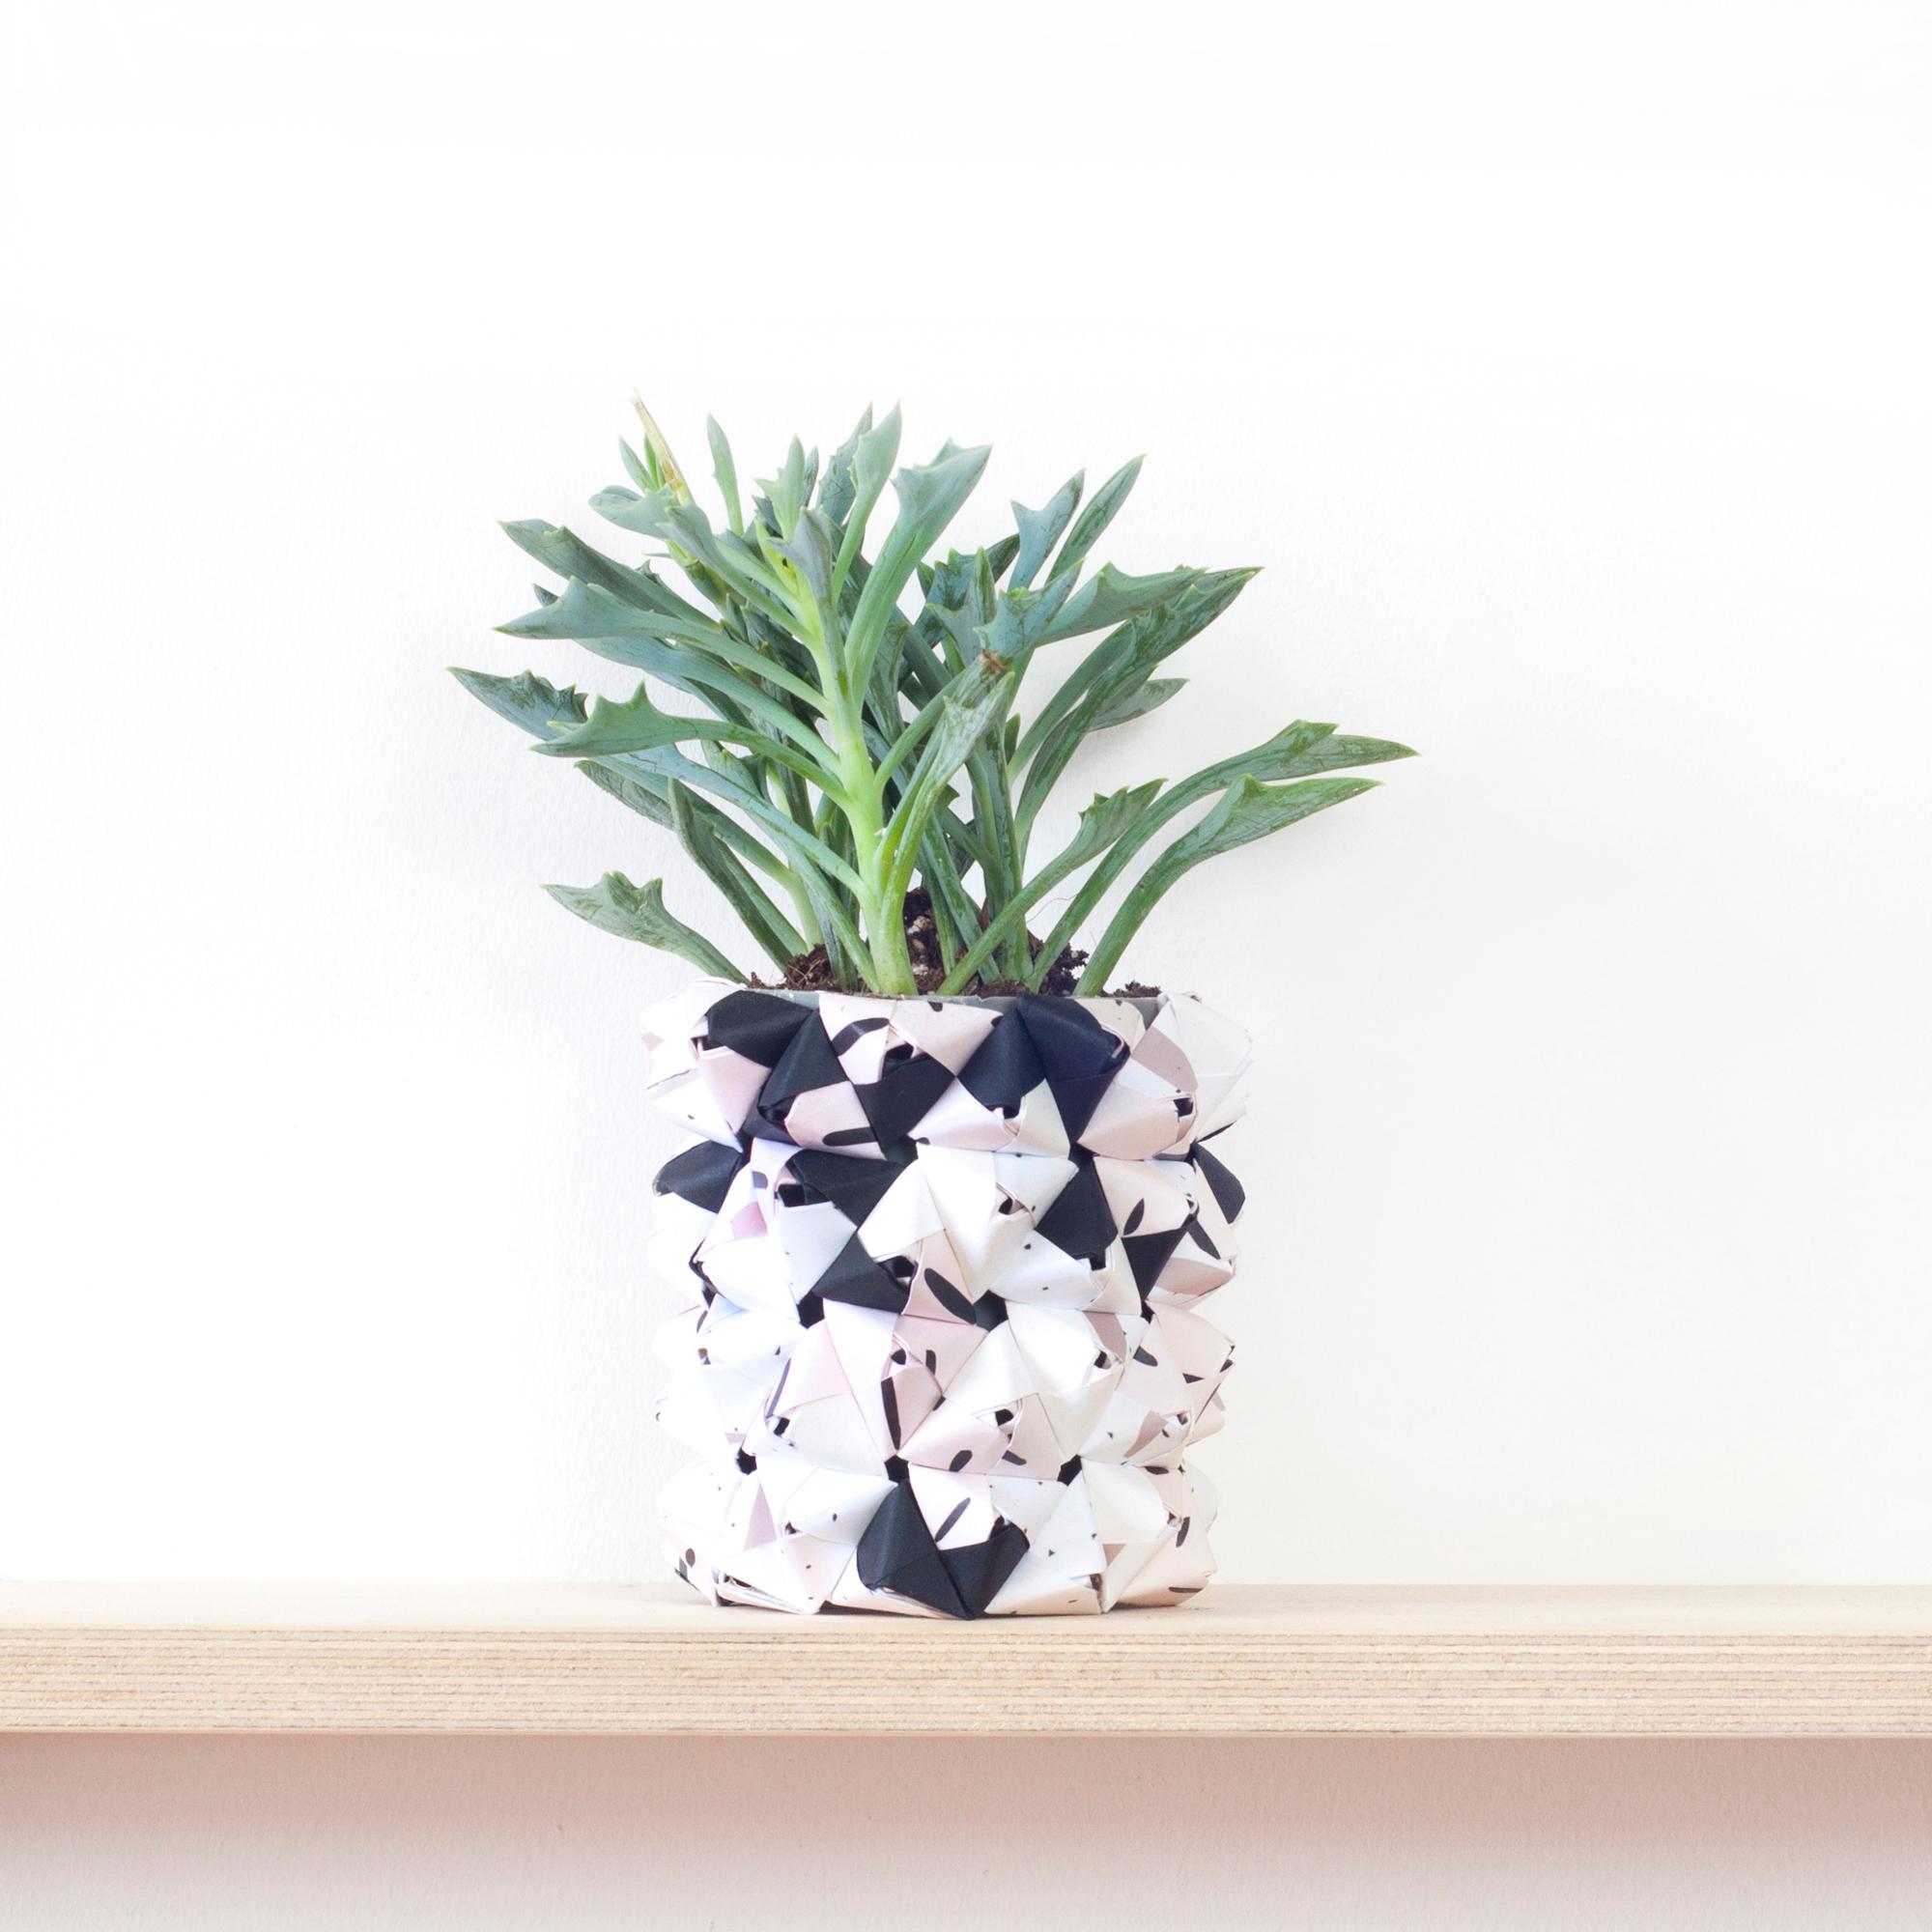 4-plantpot-origamiest-web.jpg